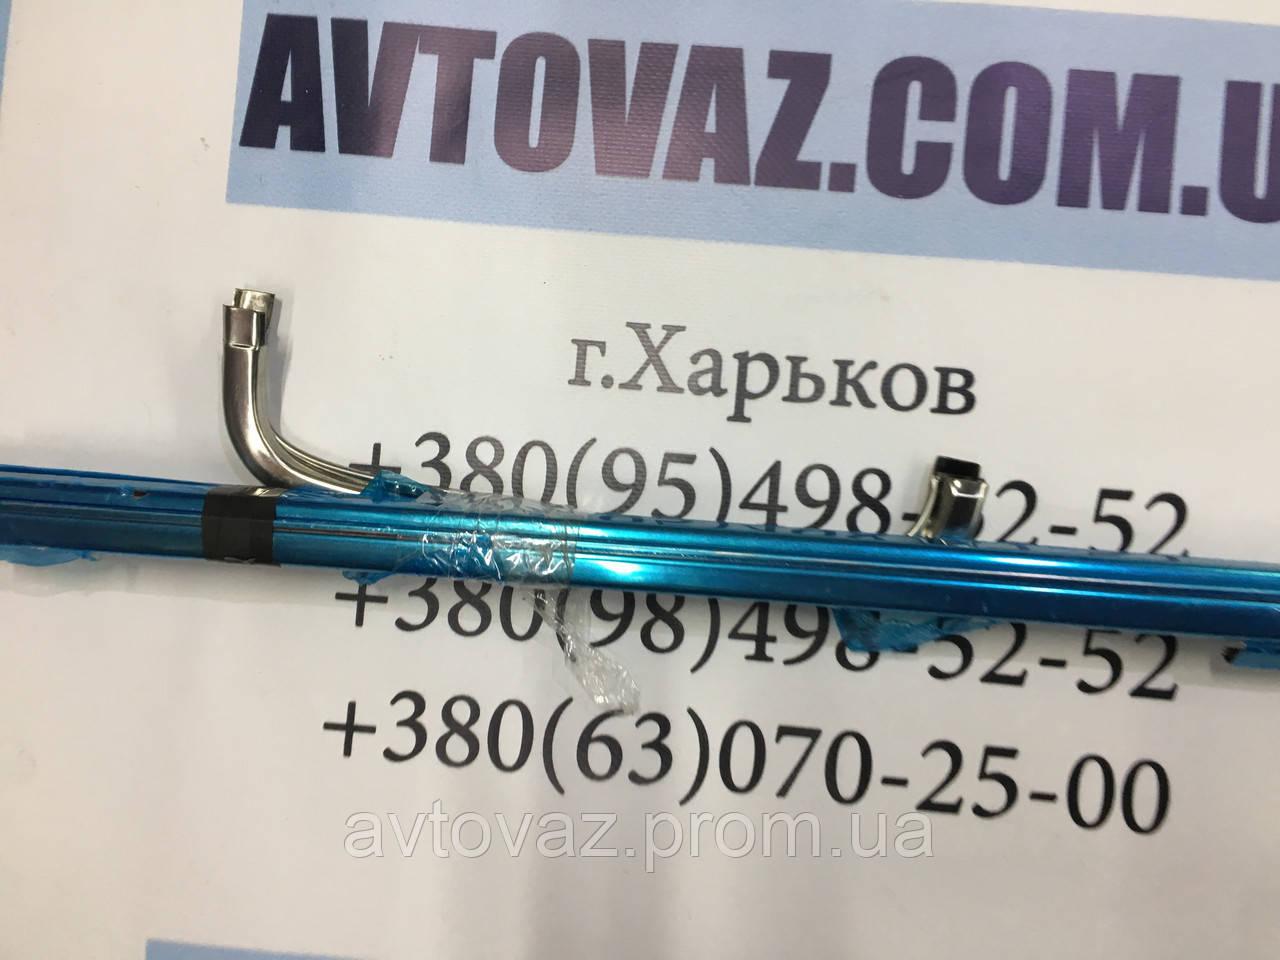 Молдинги стекл и дверей ВАЗ 2103,ВАЗ 2106 хром (накладки) к-кт